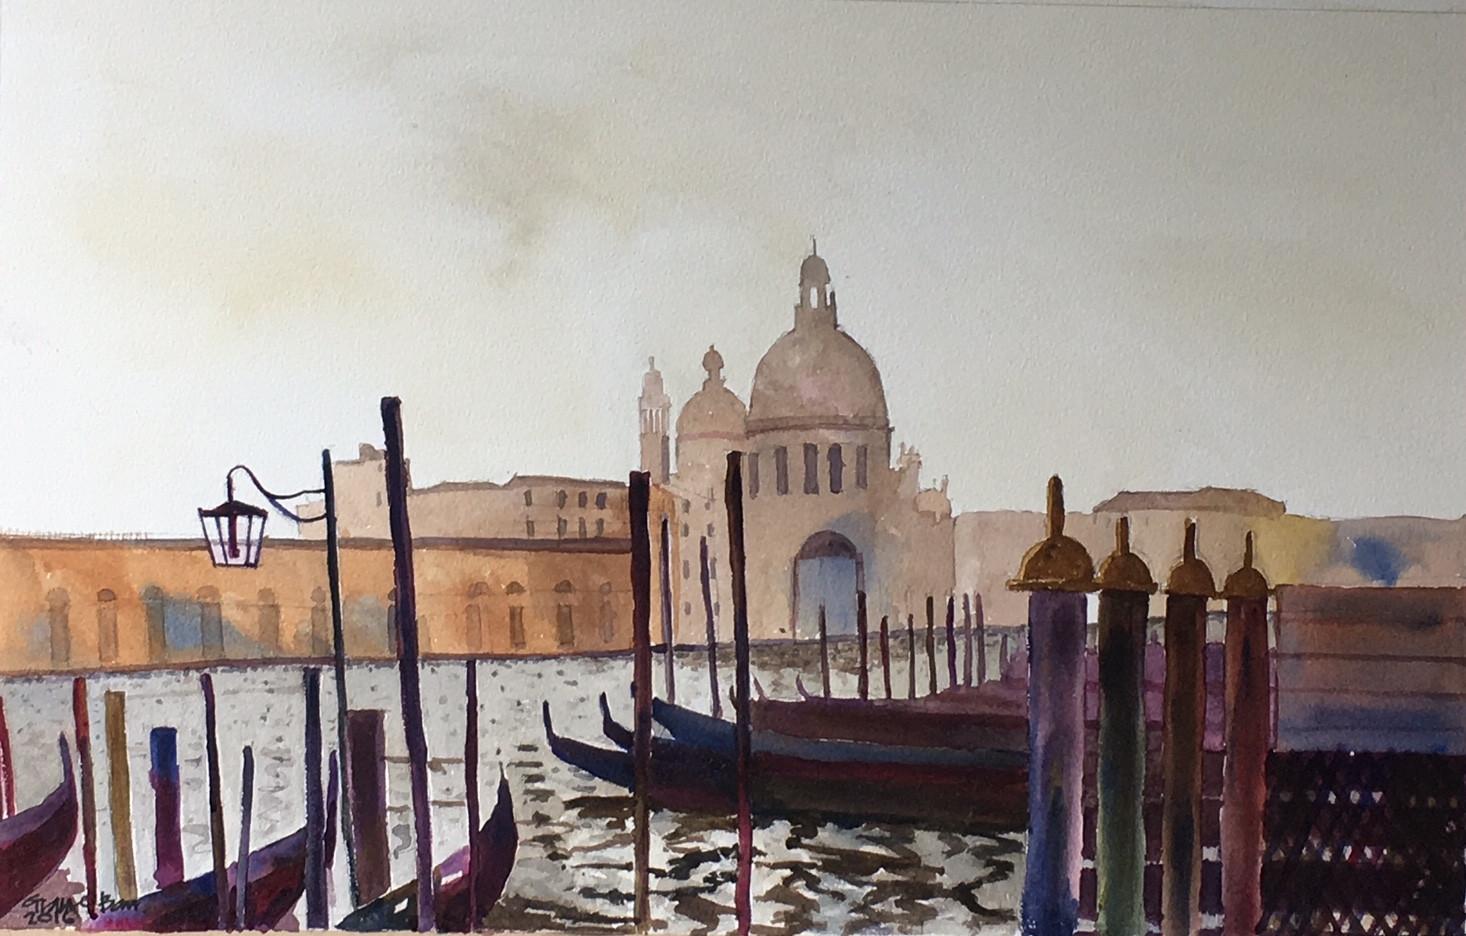 Waterfront Venice